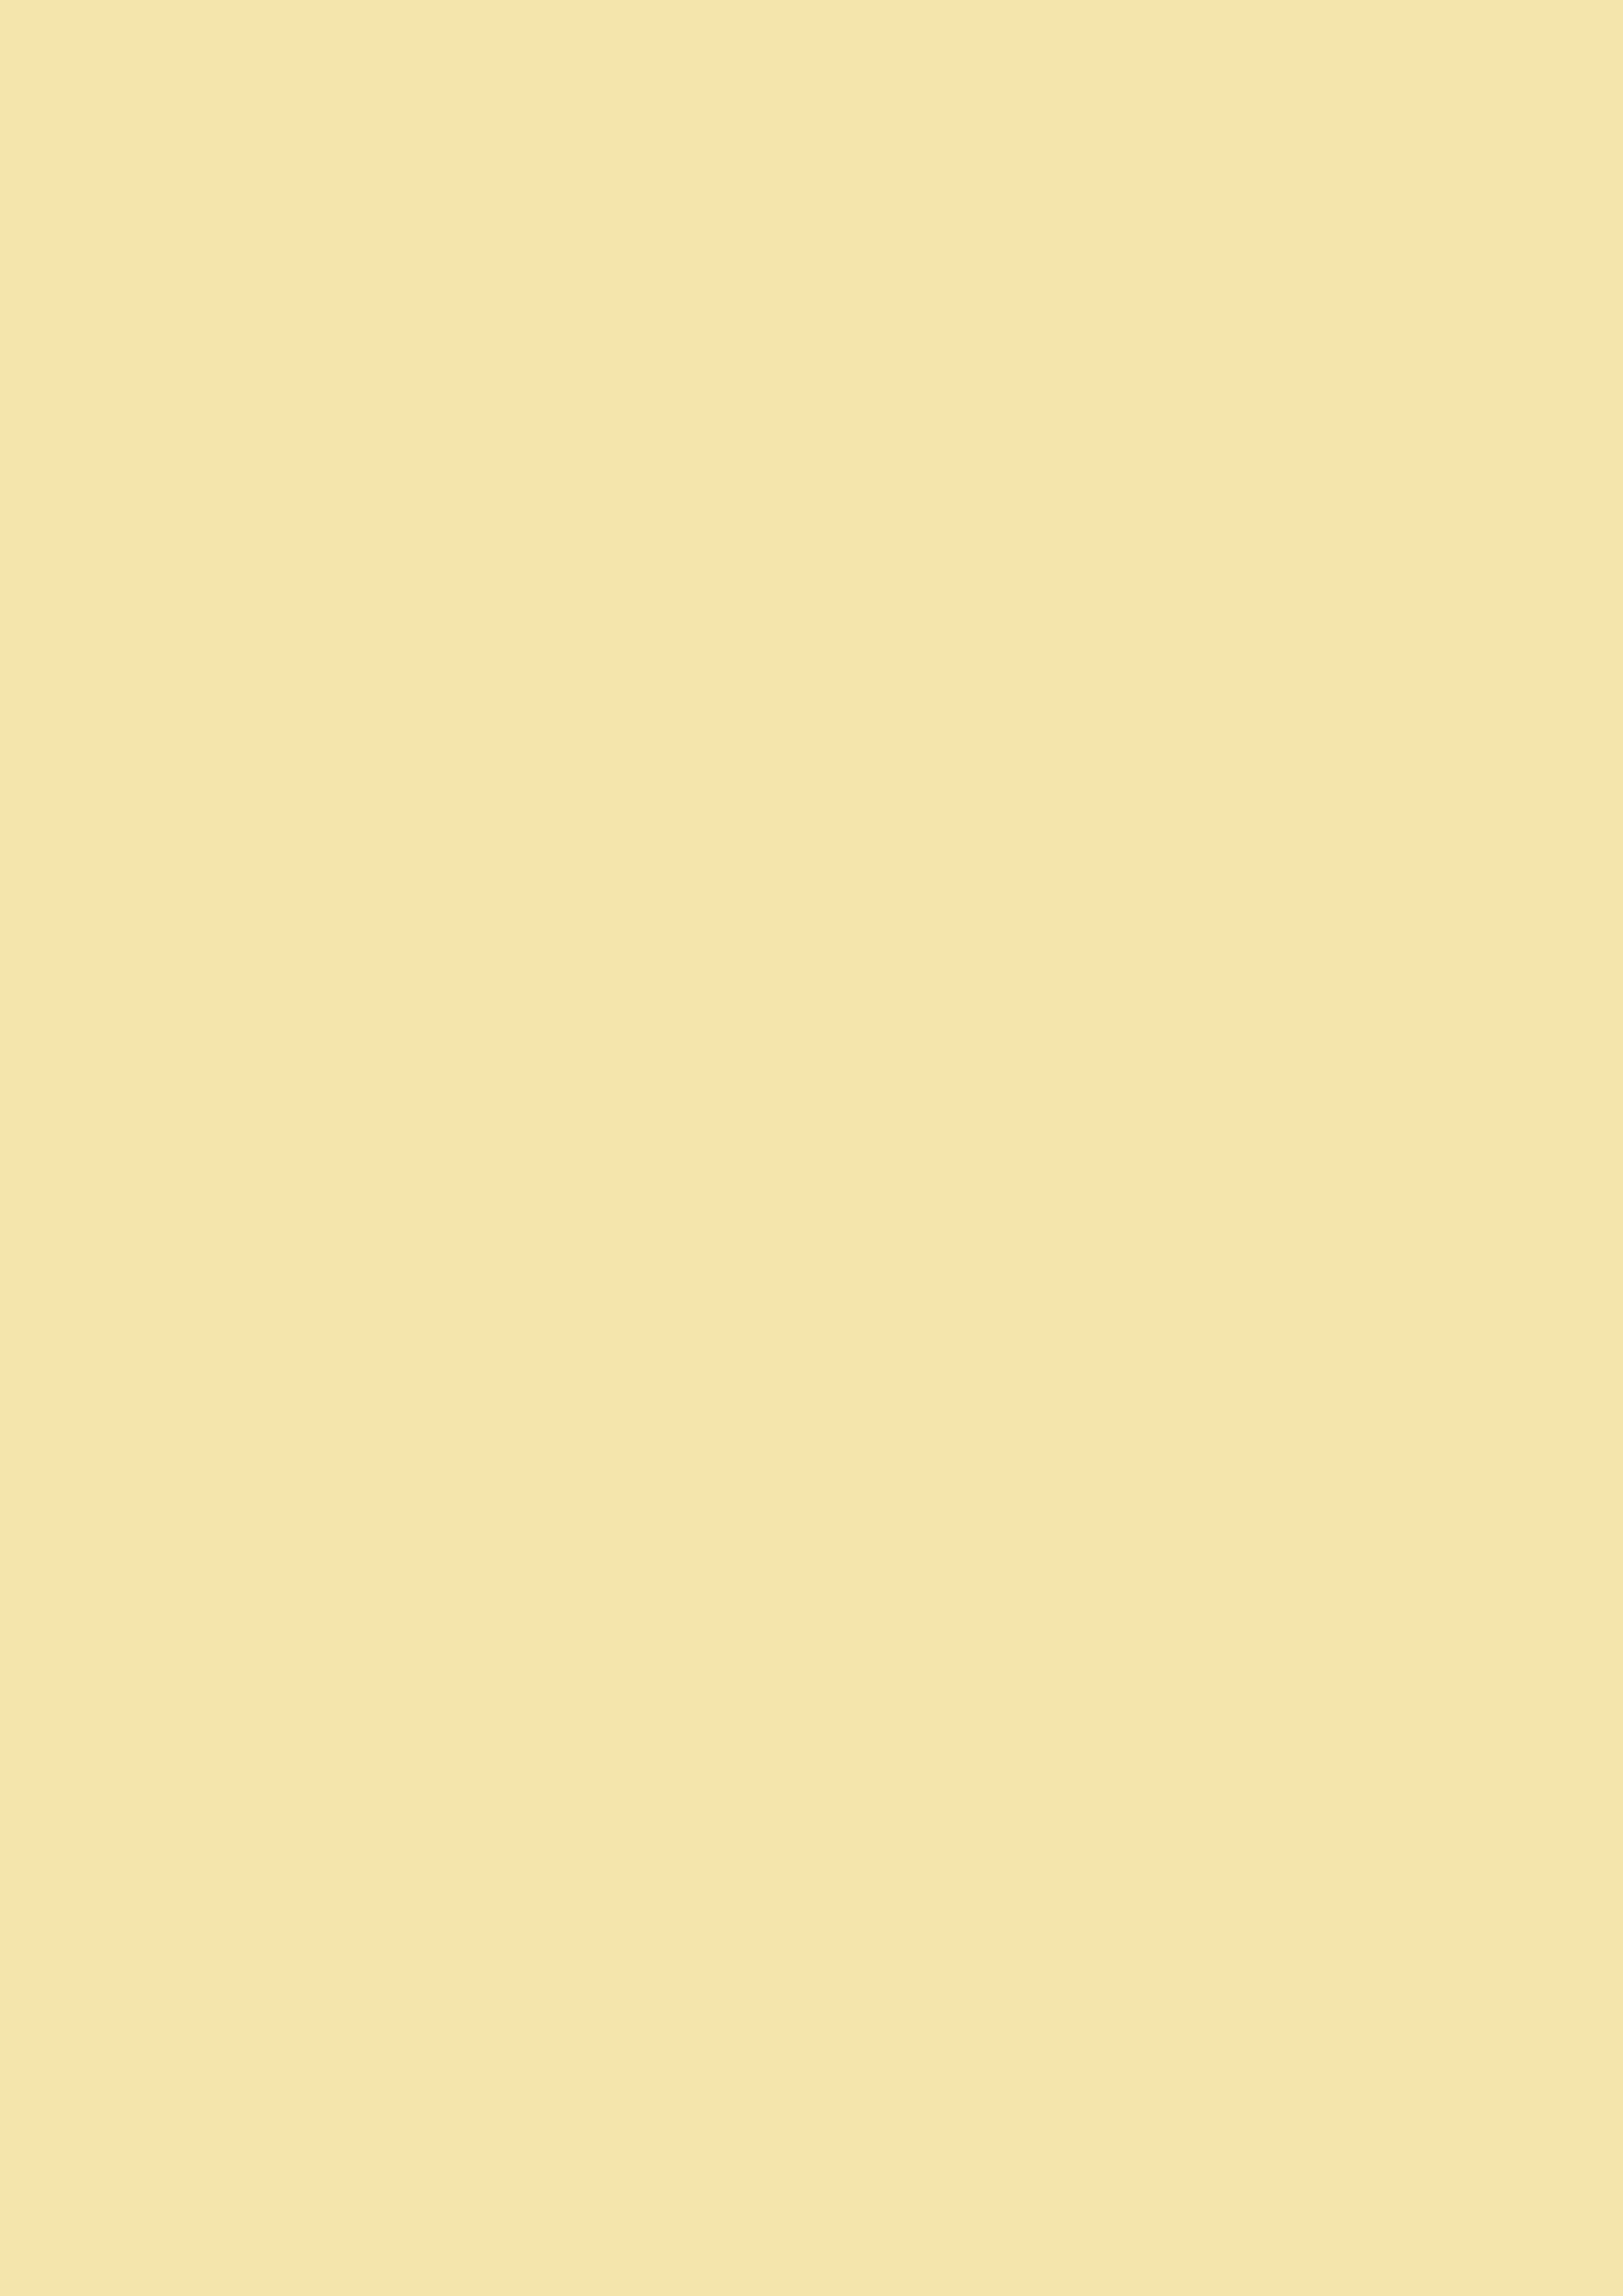 2480x3508 Vanilla Solid Color Background